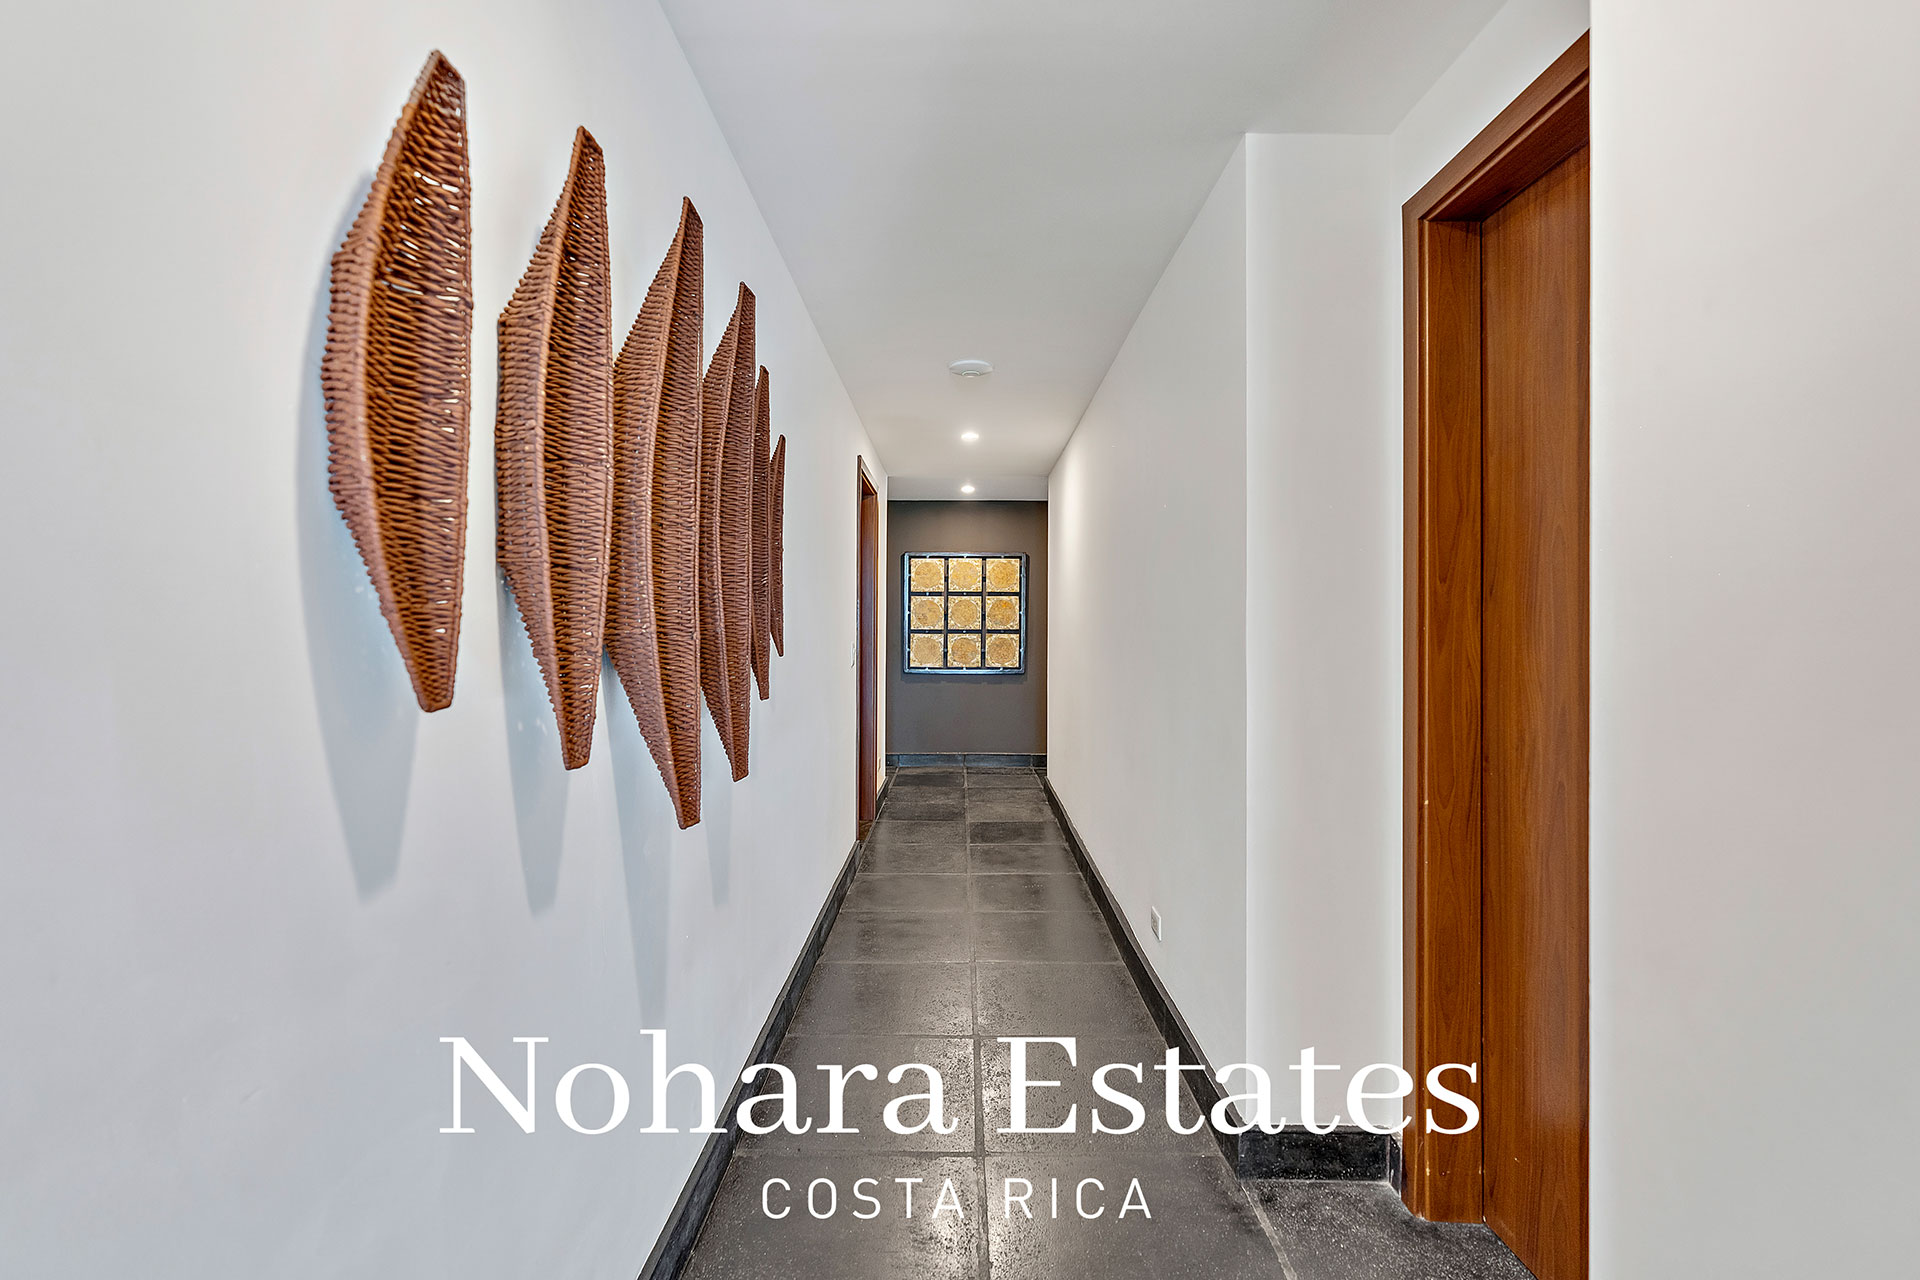 Nohara Estates Costa Rica 128 Penthouse Quepos Los Altos 6